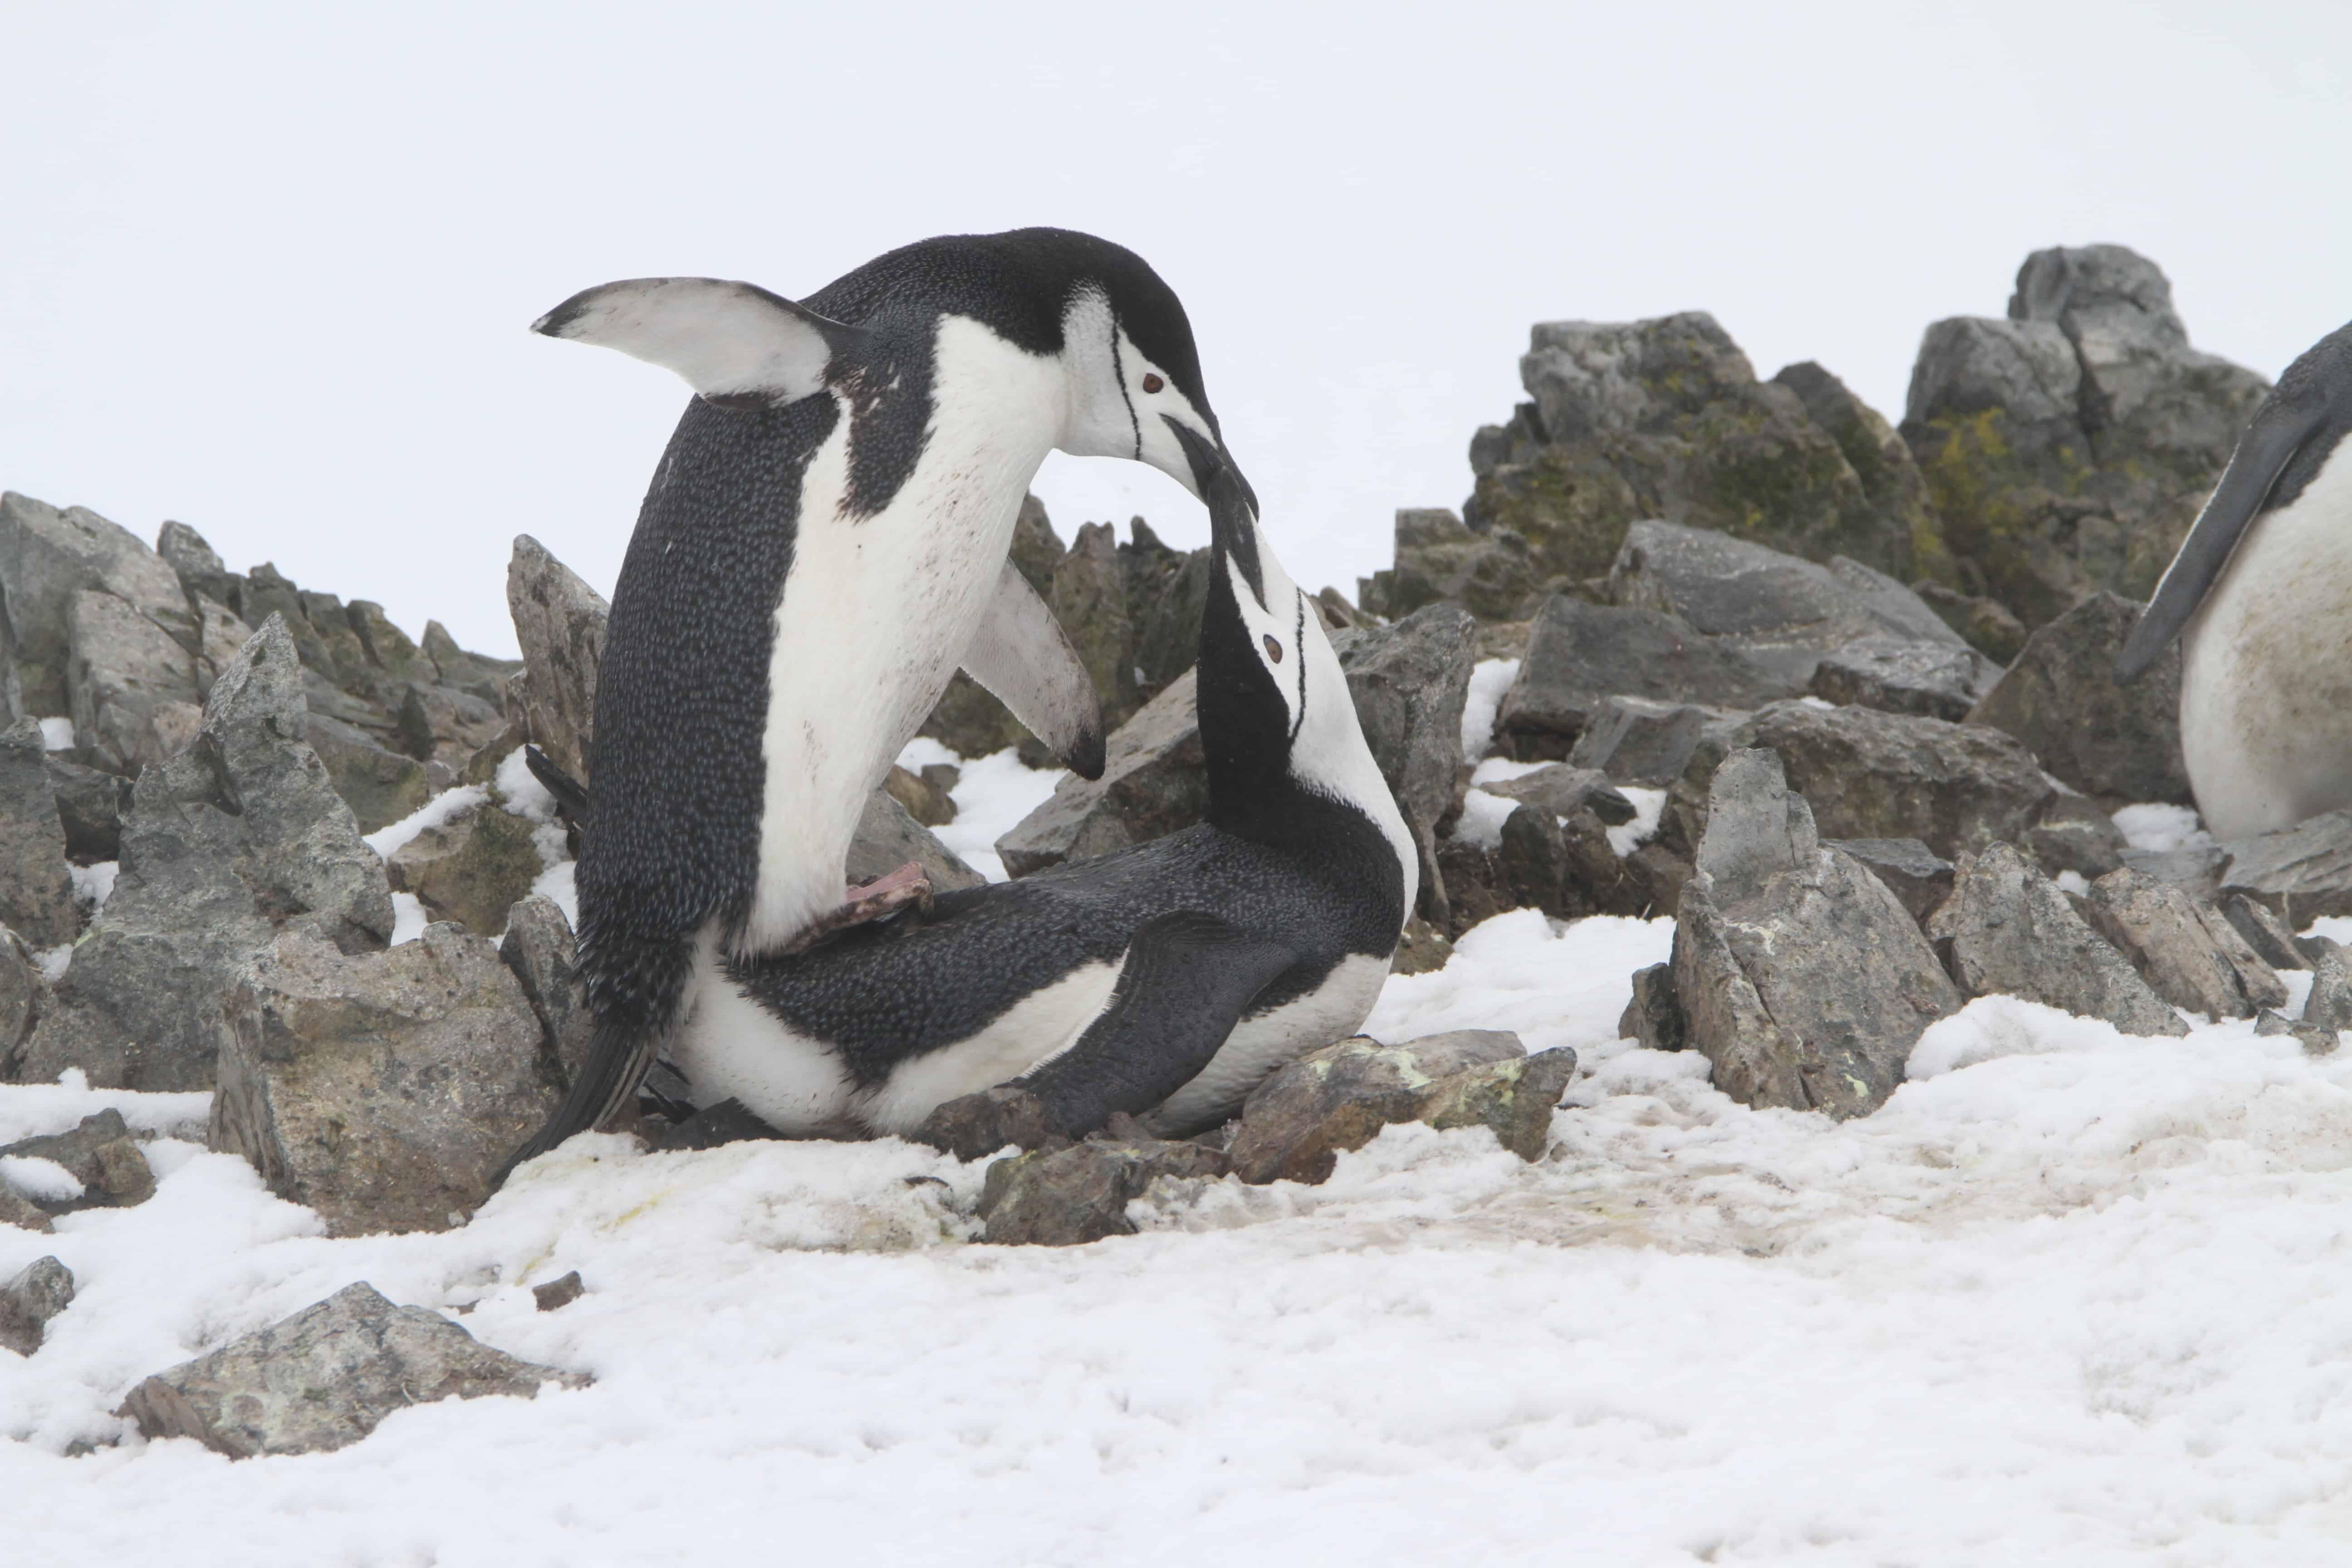 Chinstrap penguin Pygoscelis antarcticus pair at nest site. Copyright: Dr Mike Pienkowski